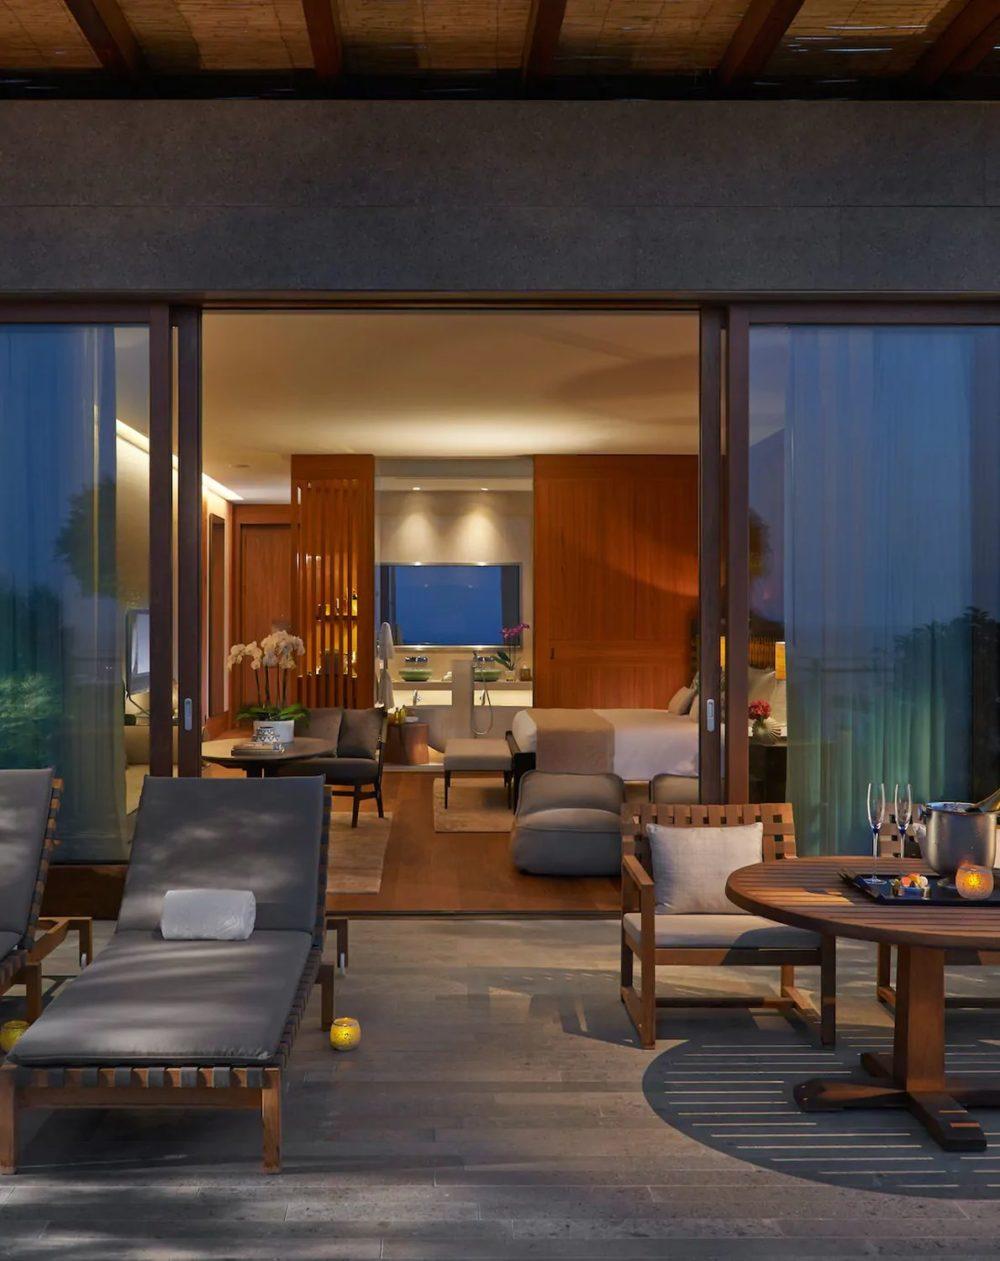 Mandarin Oriental, Bodrum offers the perfect retreat at Cennet Koyu